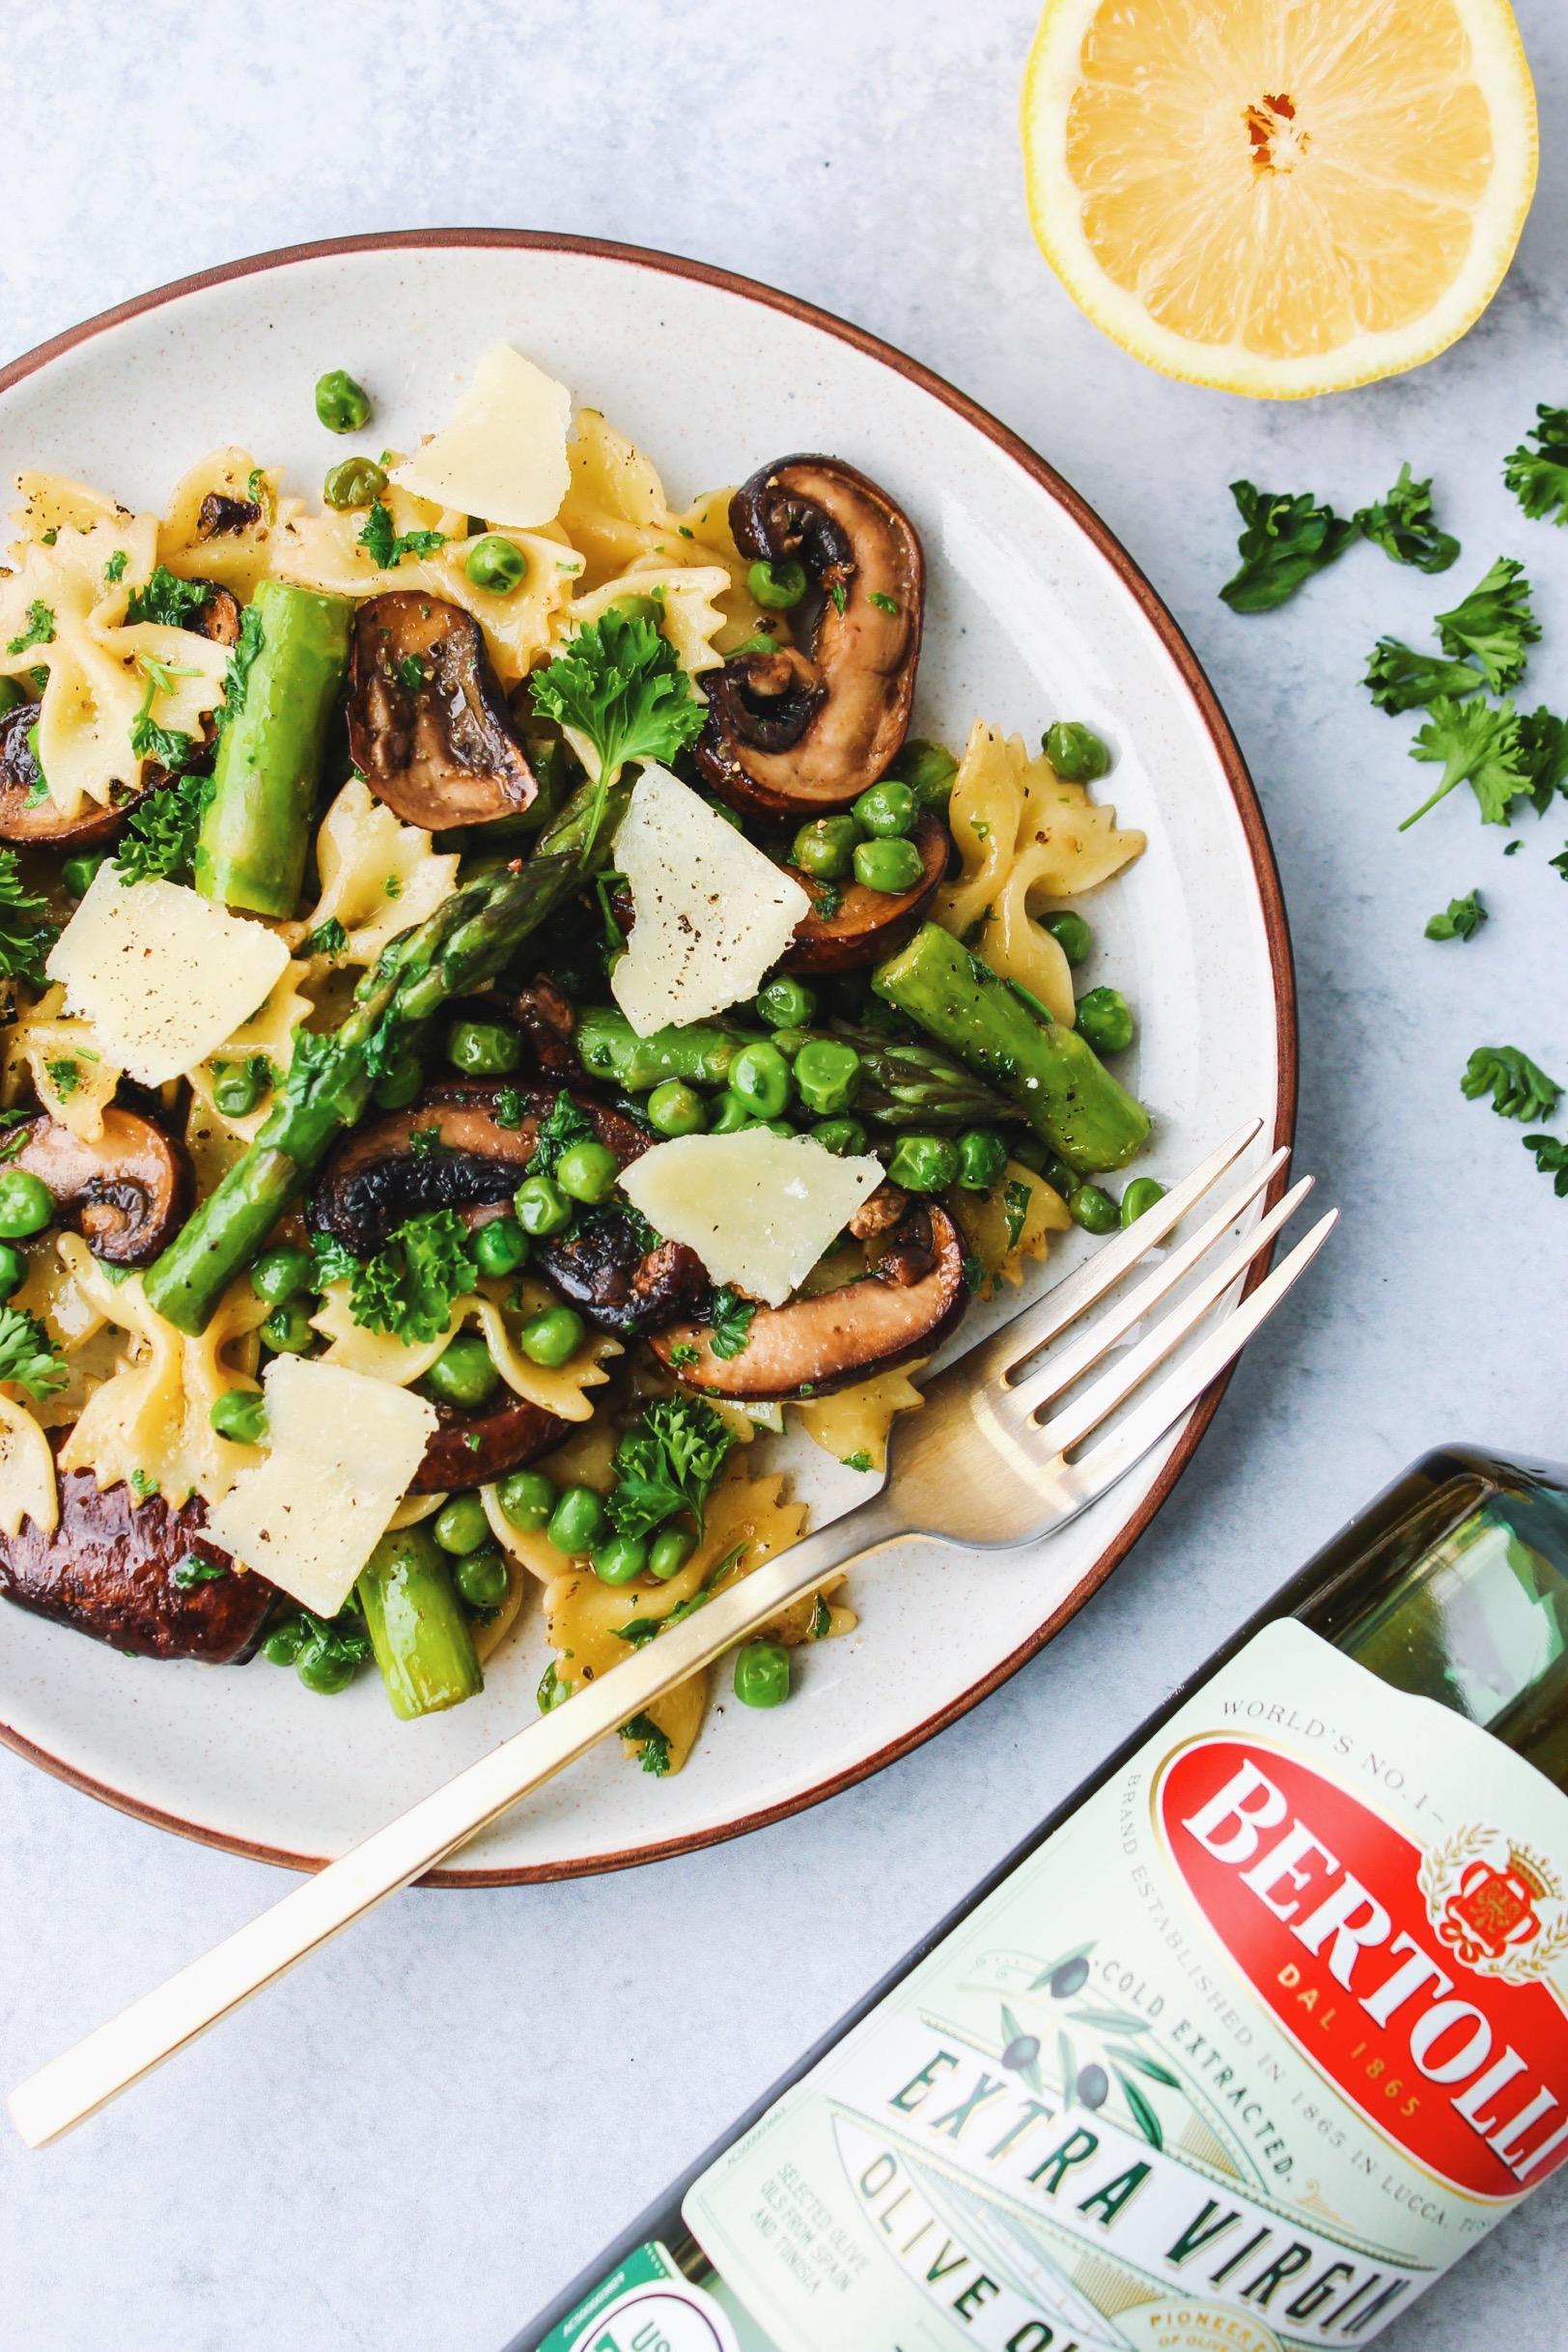 Bertolli Extra Virgin Olive Oil with Springtime Pasta